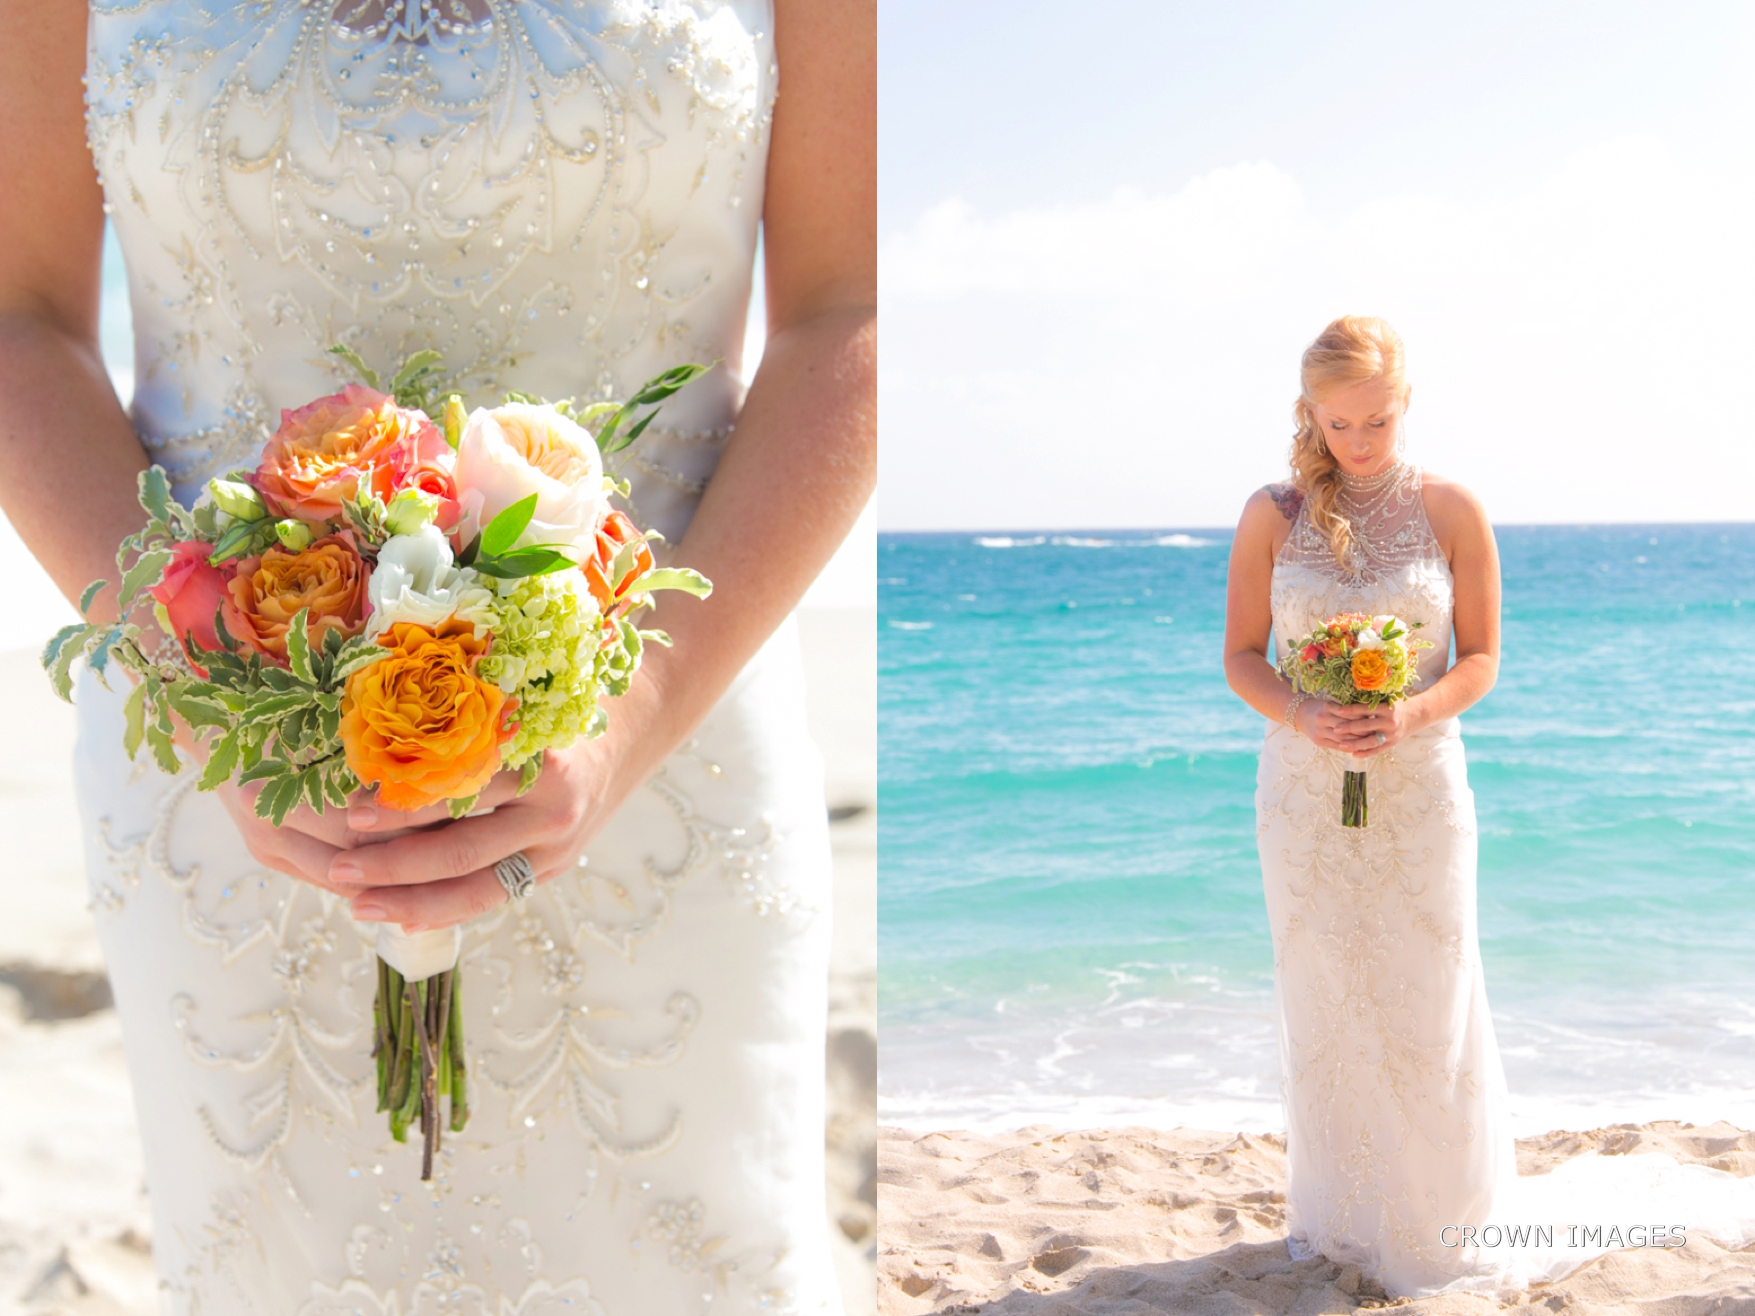 wedding_photos_saint_thomas_crown_images_0588.jpg